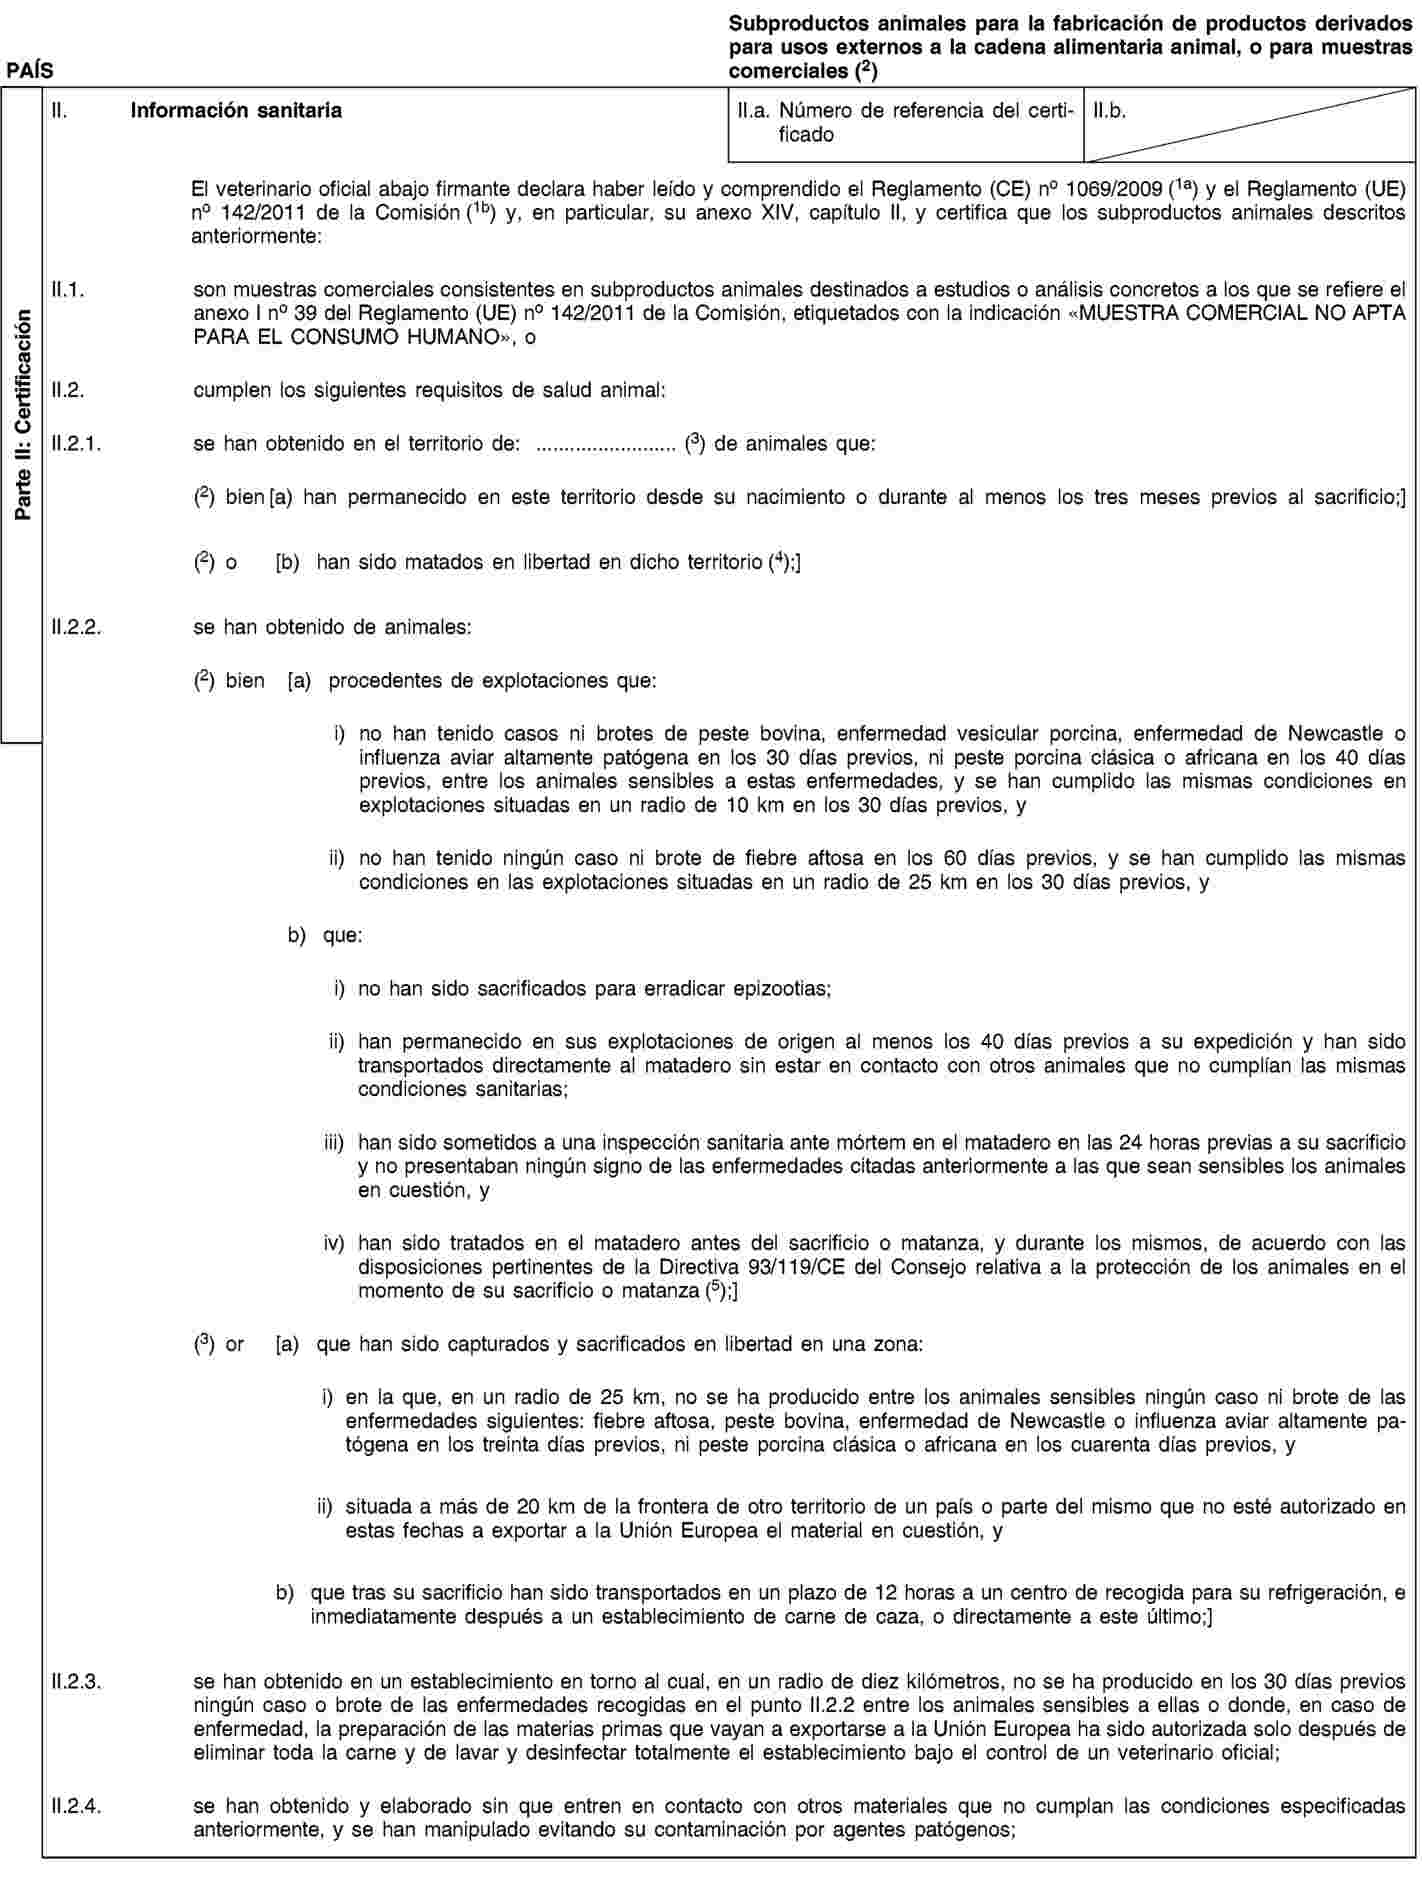 Imagen: https://eur-lex.europa.eu/resource.html?uri=uriserv:OJ.L_.2011.054.01.0001.01.SPA.xhtml.L_2011054ES.01019701.tif.jpg